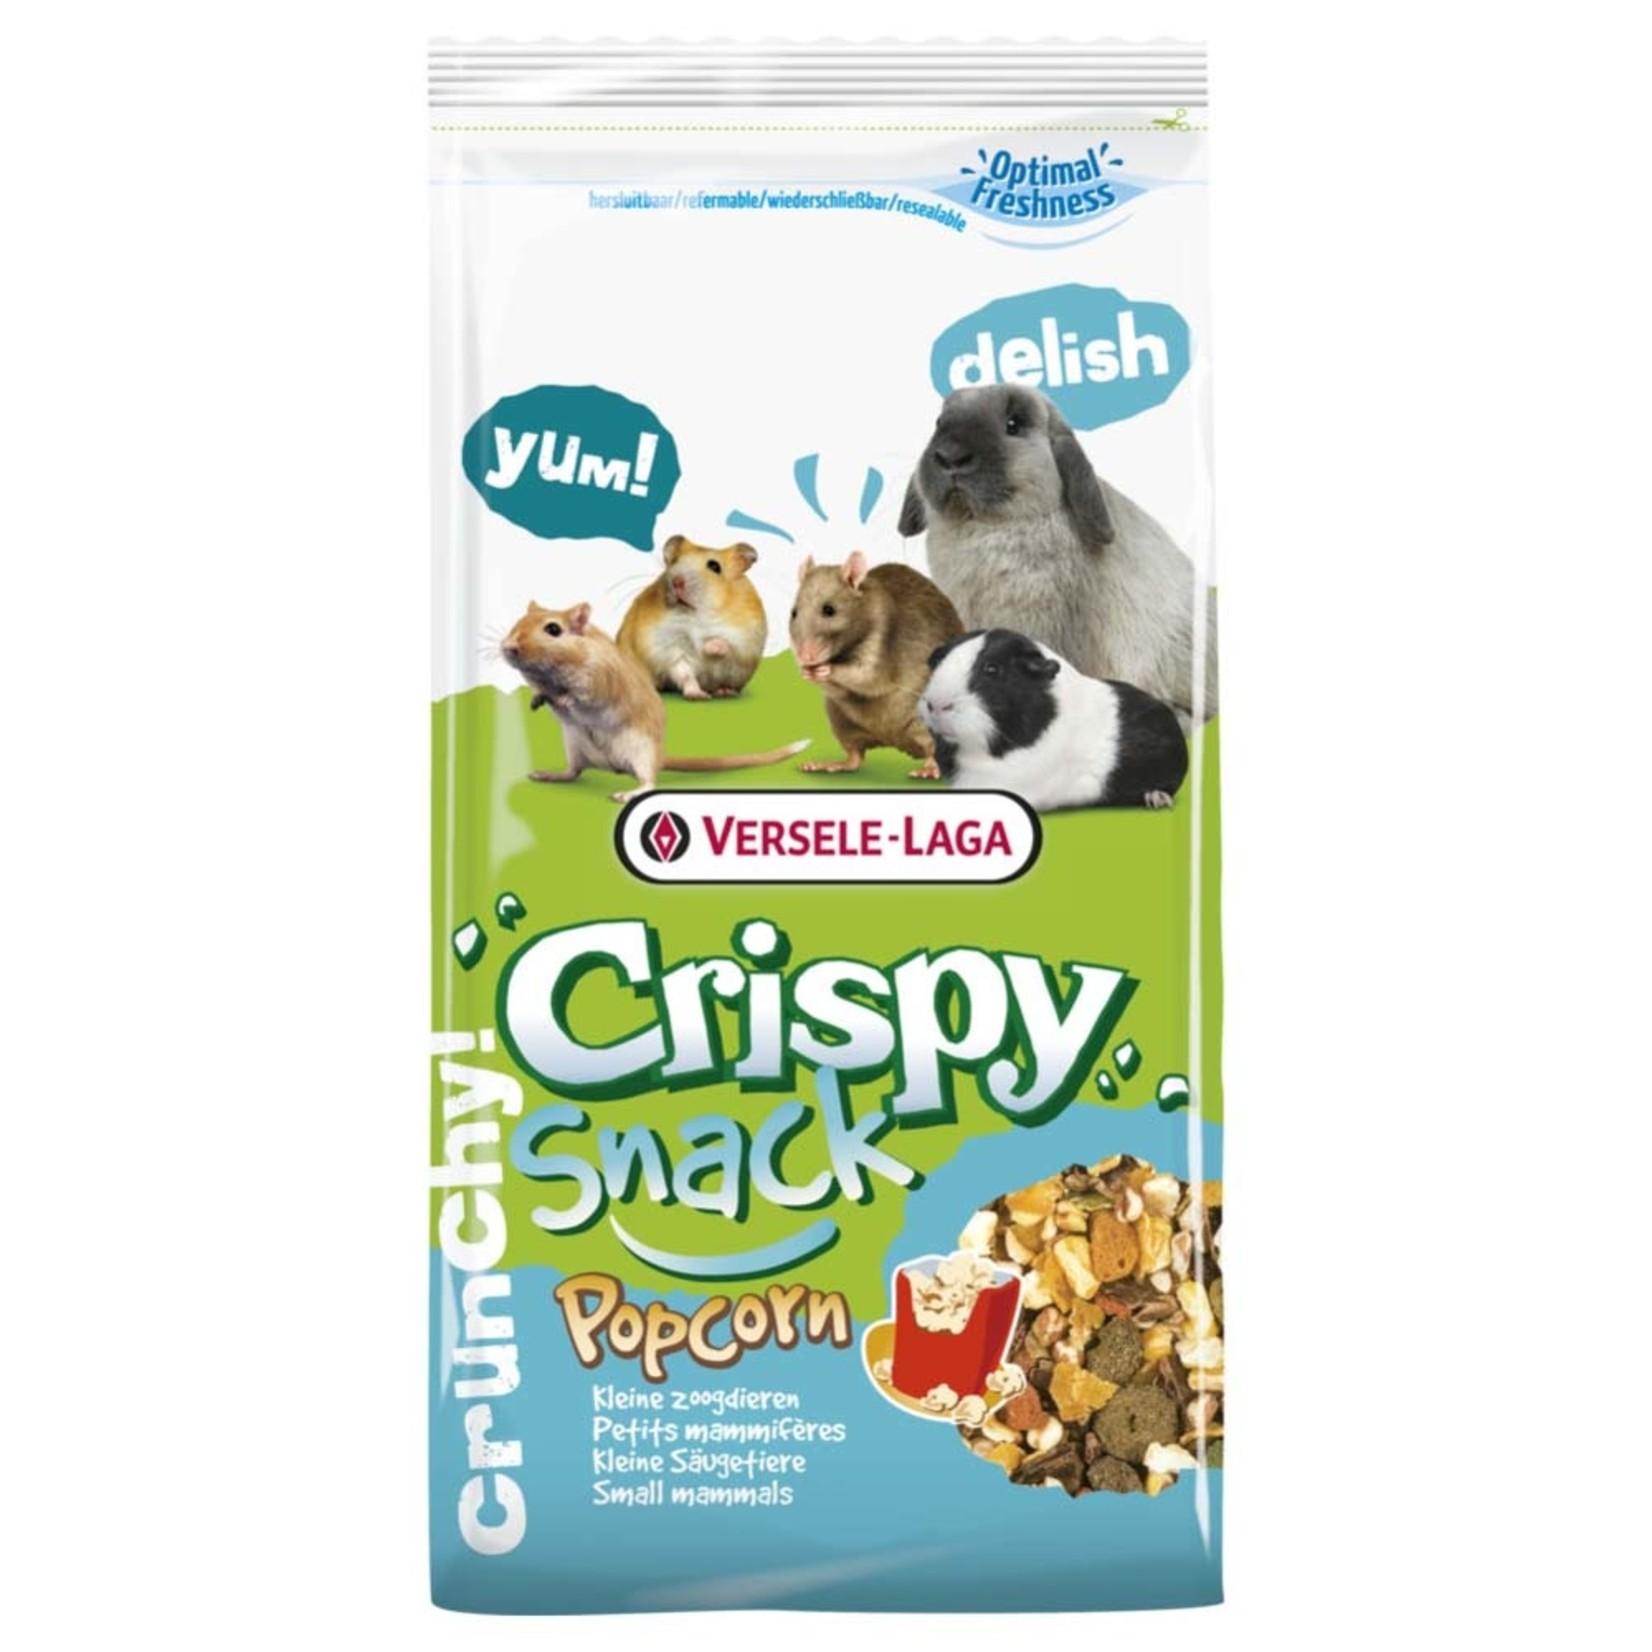 Versele-Laga Crispy Snack for Small Pets Popcorn